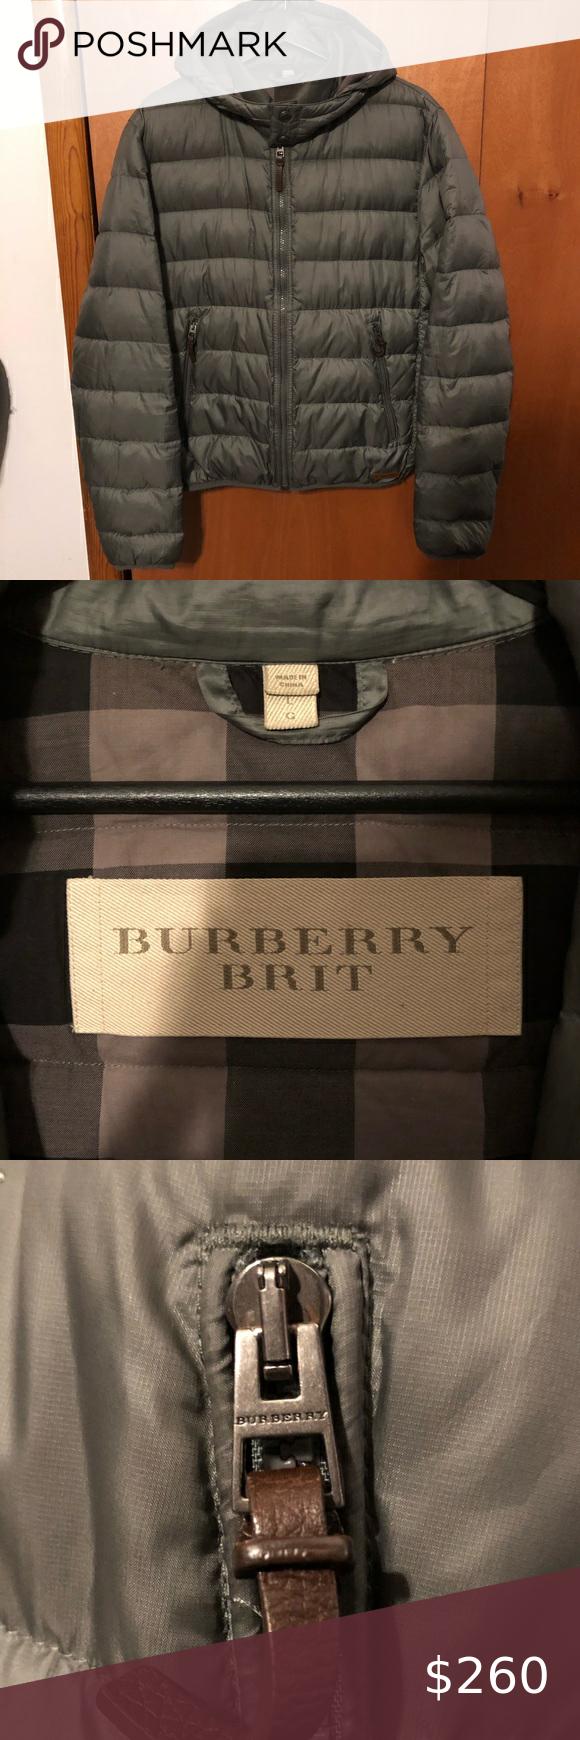 Men's Burberry Light Down Jacket Burberry Brit Ultra Light